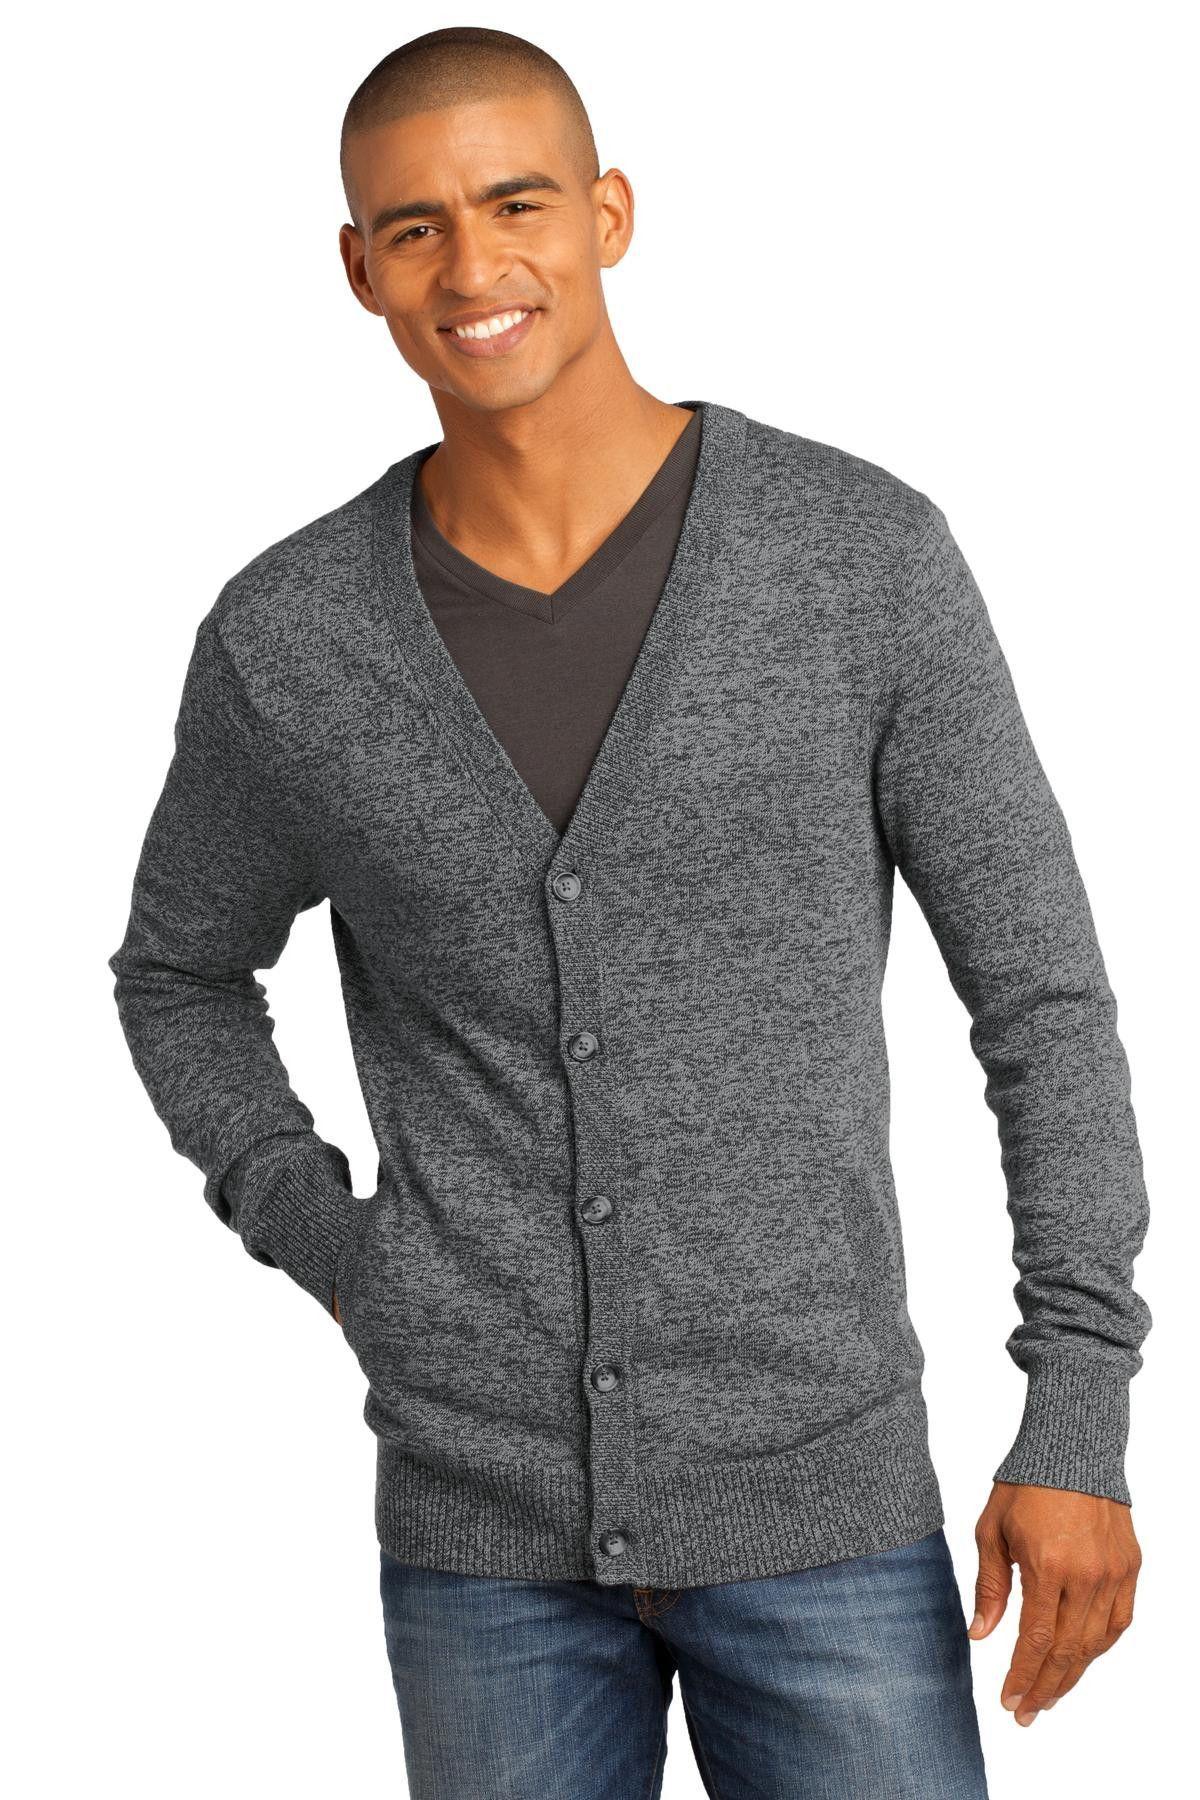 District Made - Mens Cardigan Sweater DM315 Warm Grey | Cardigans ...